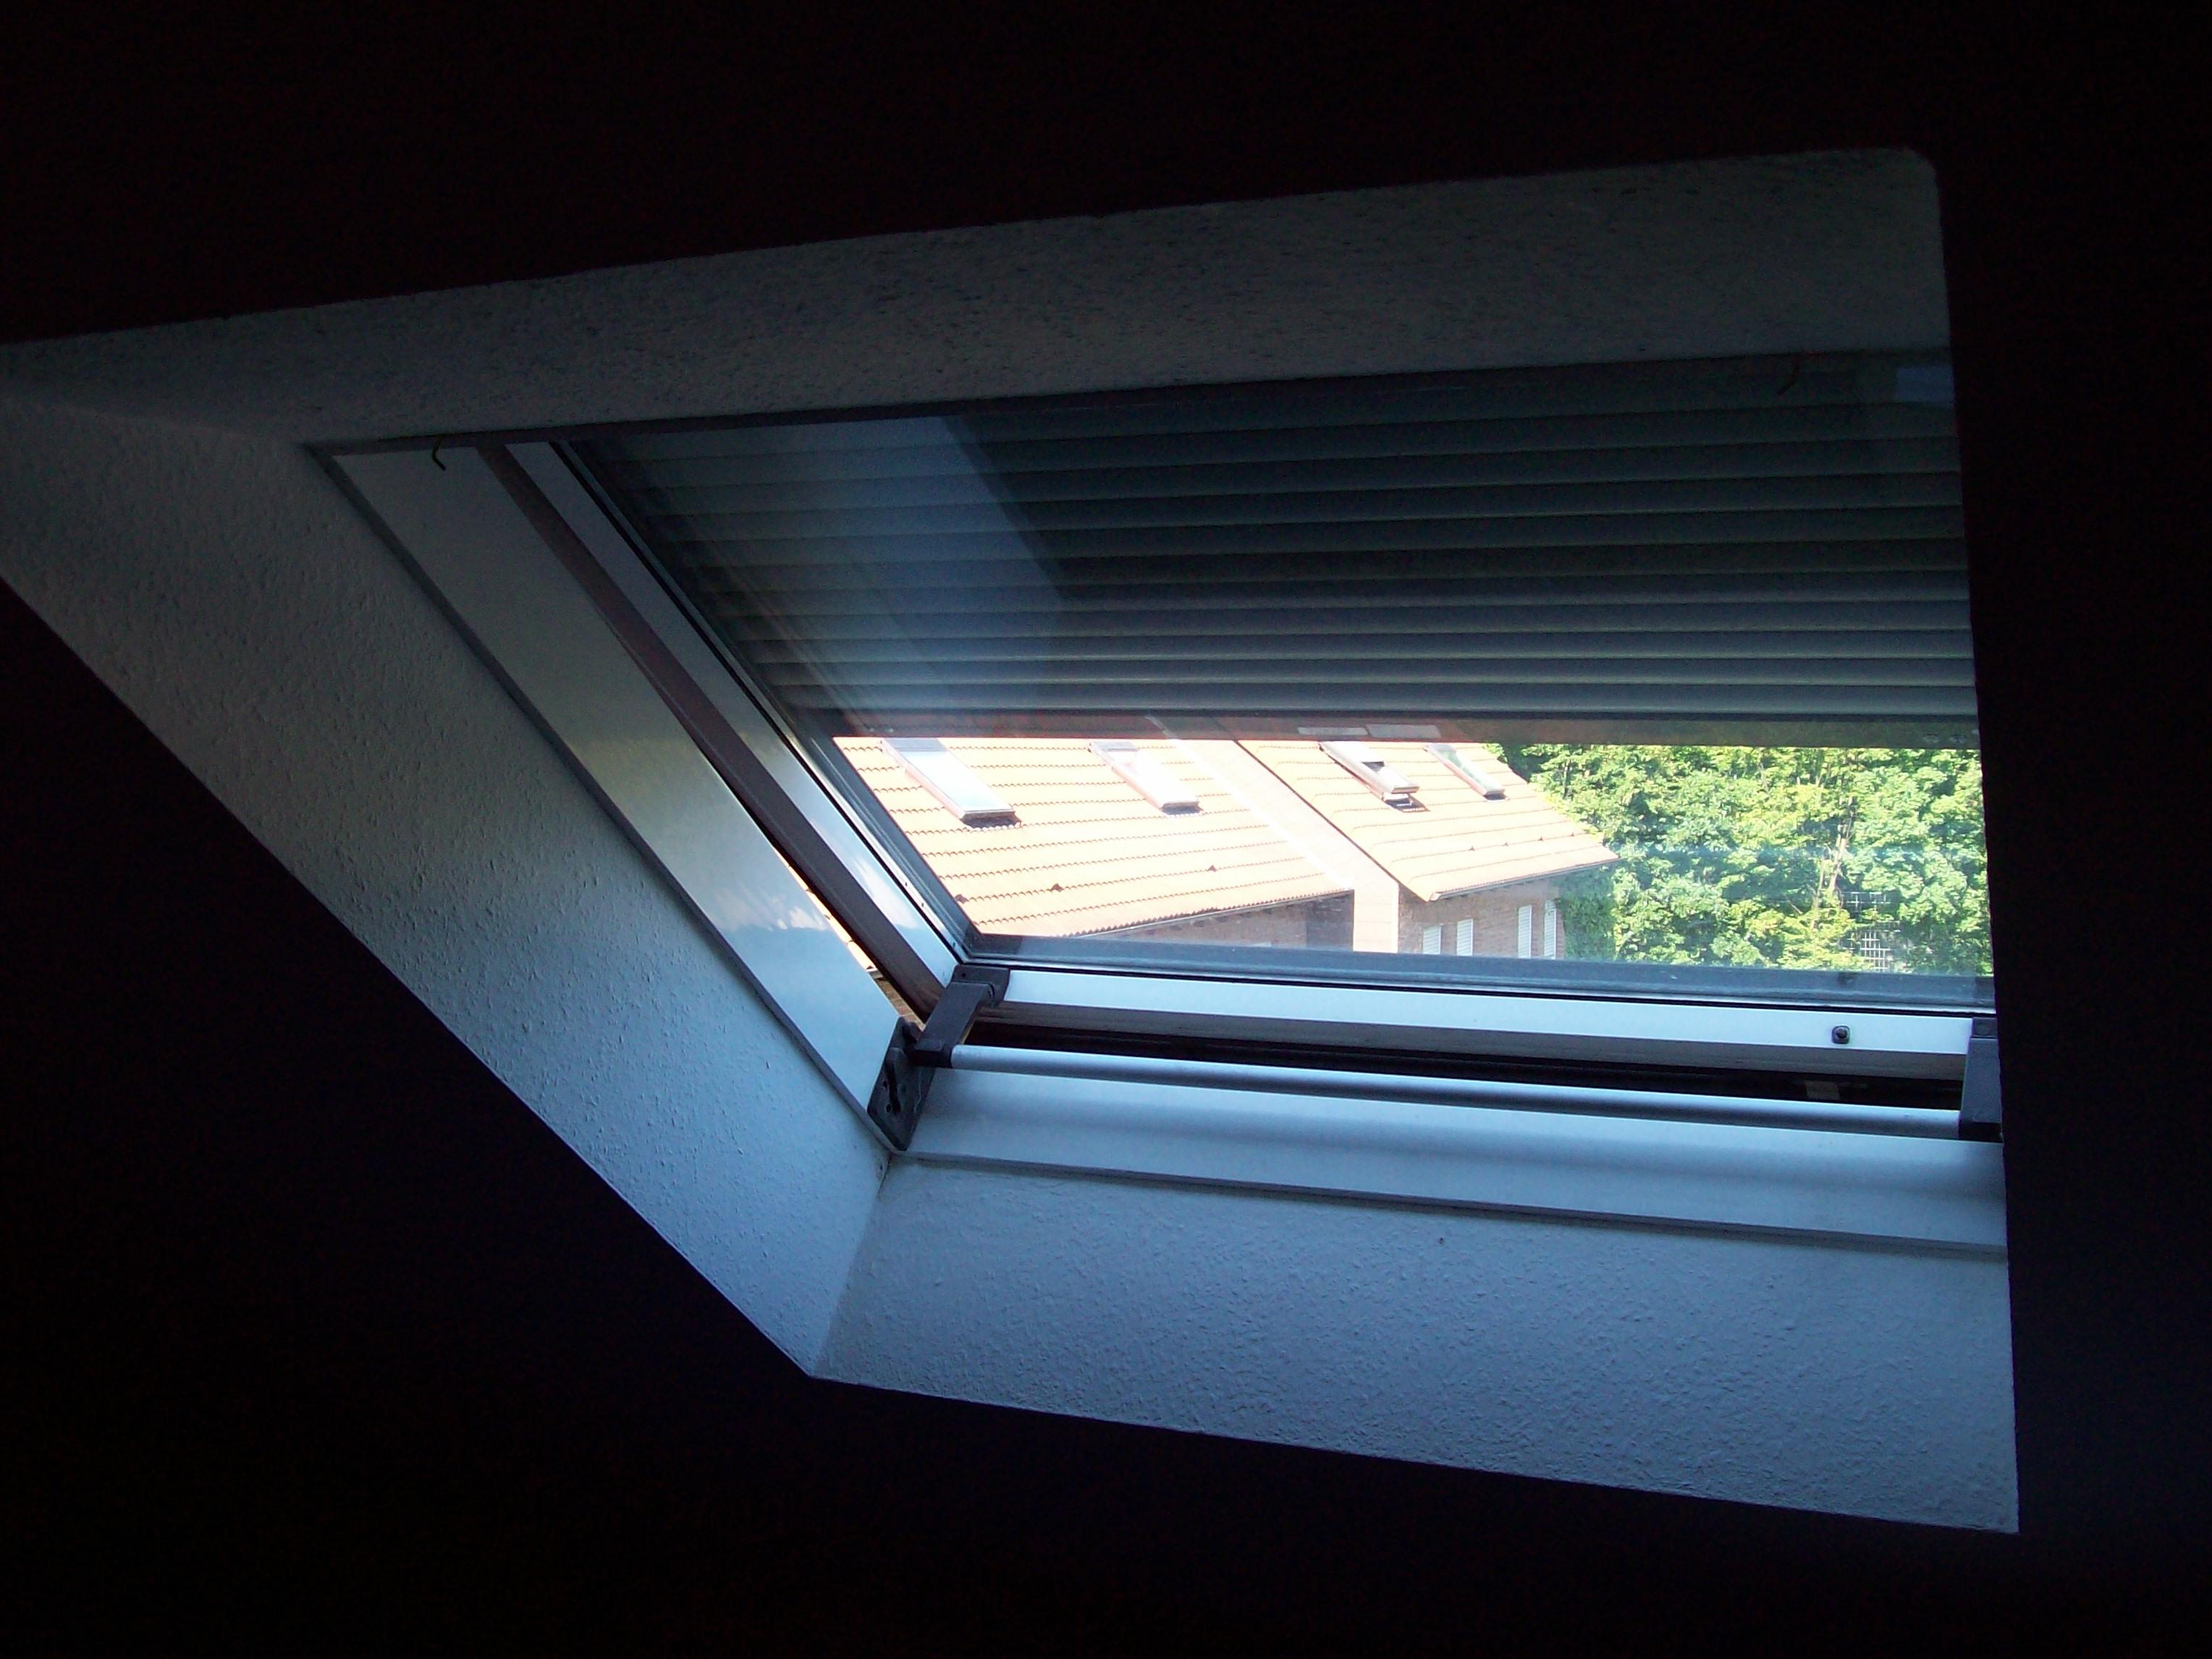 rolladen dachfenster beautiful velux ssl sk s with rolladen dachfenster free das zeichnet aus. Black Bedroom Furniture Sets. Home Design Ideas